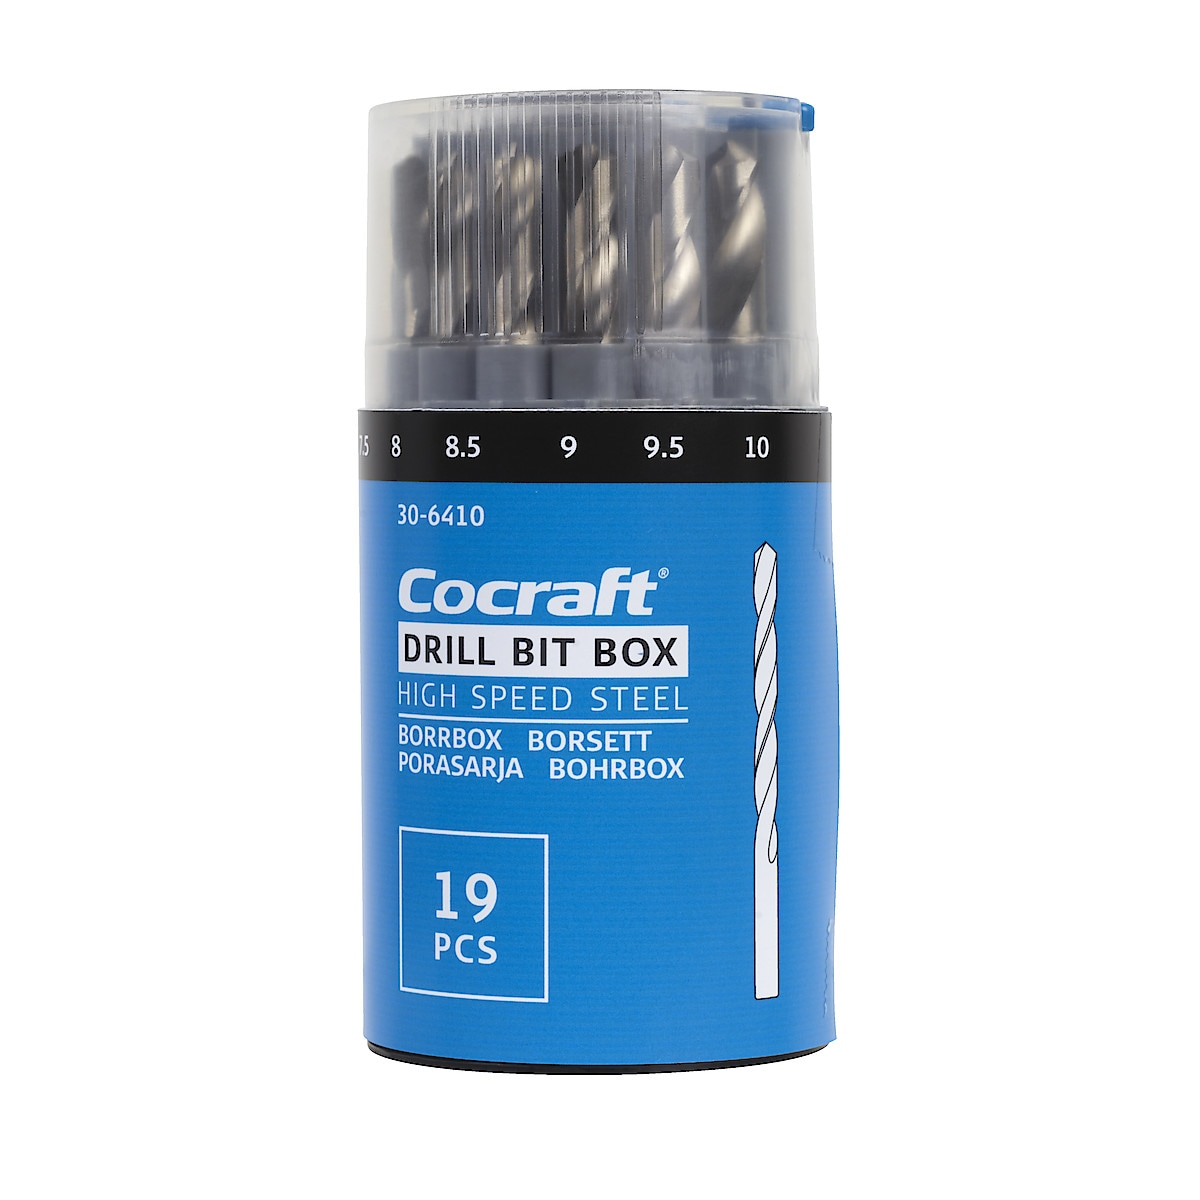 Cocraft 19-Piece HSS Drill Bit Box